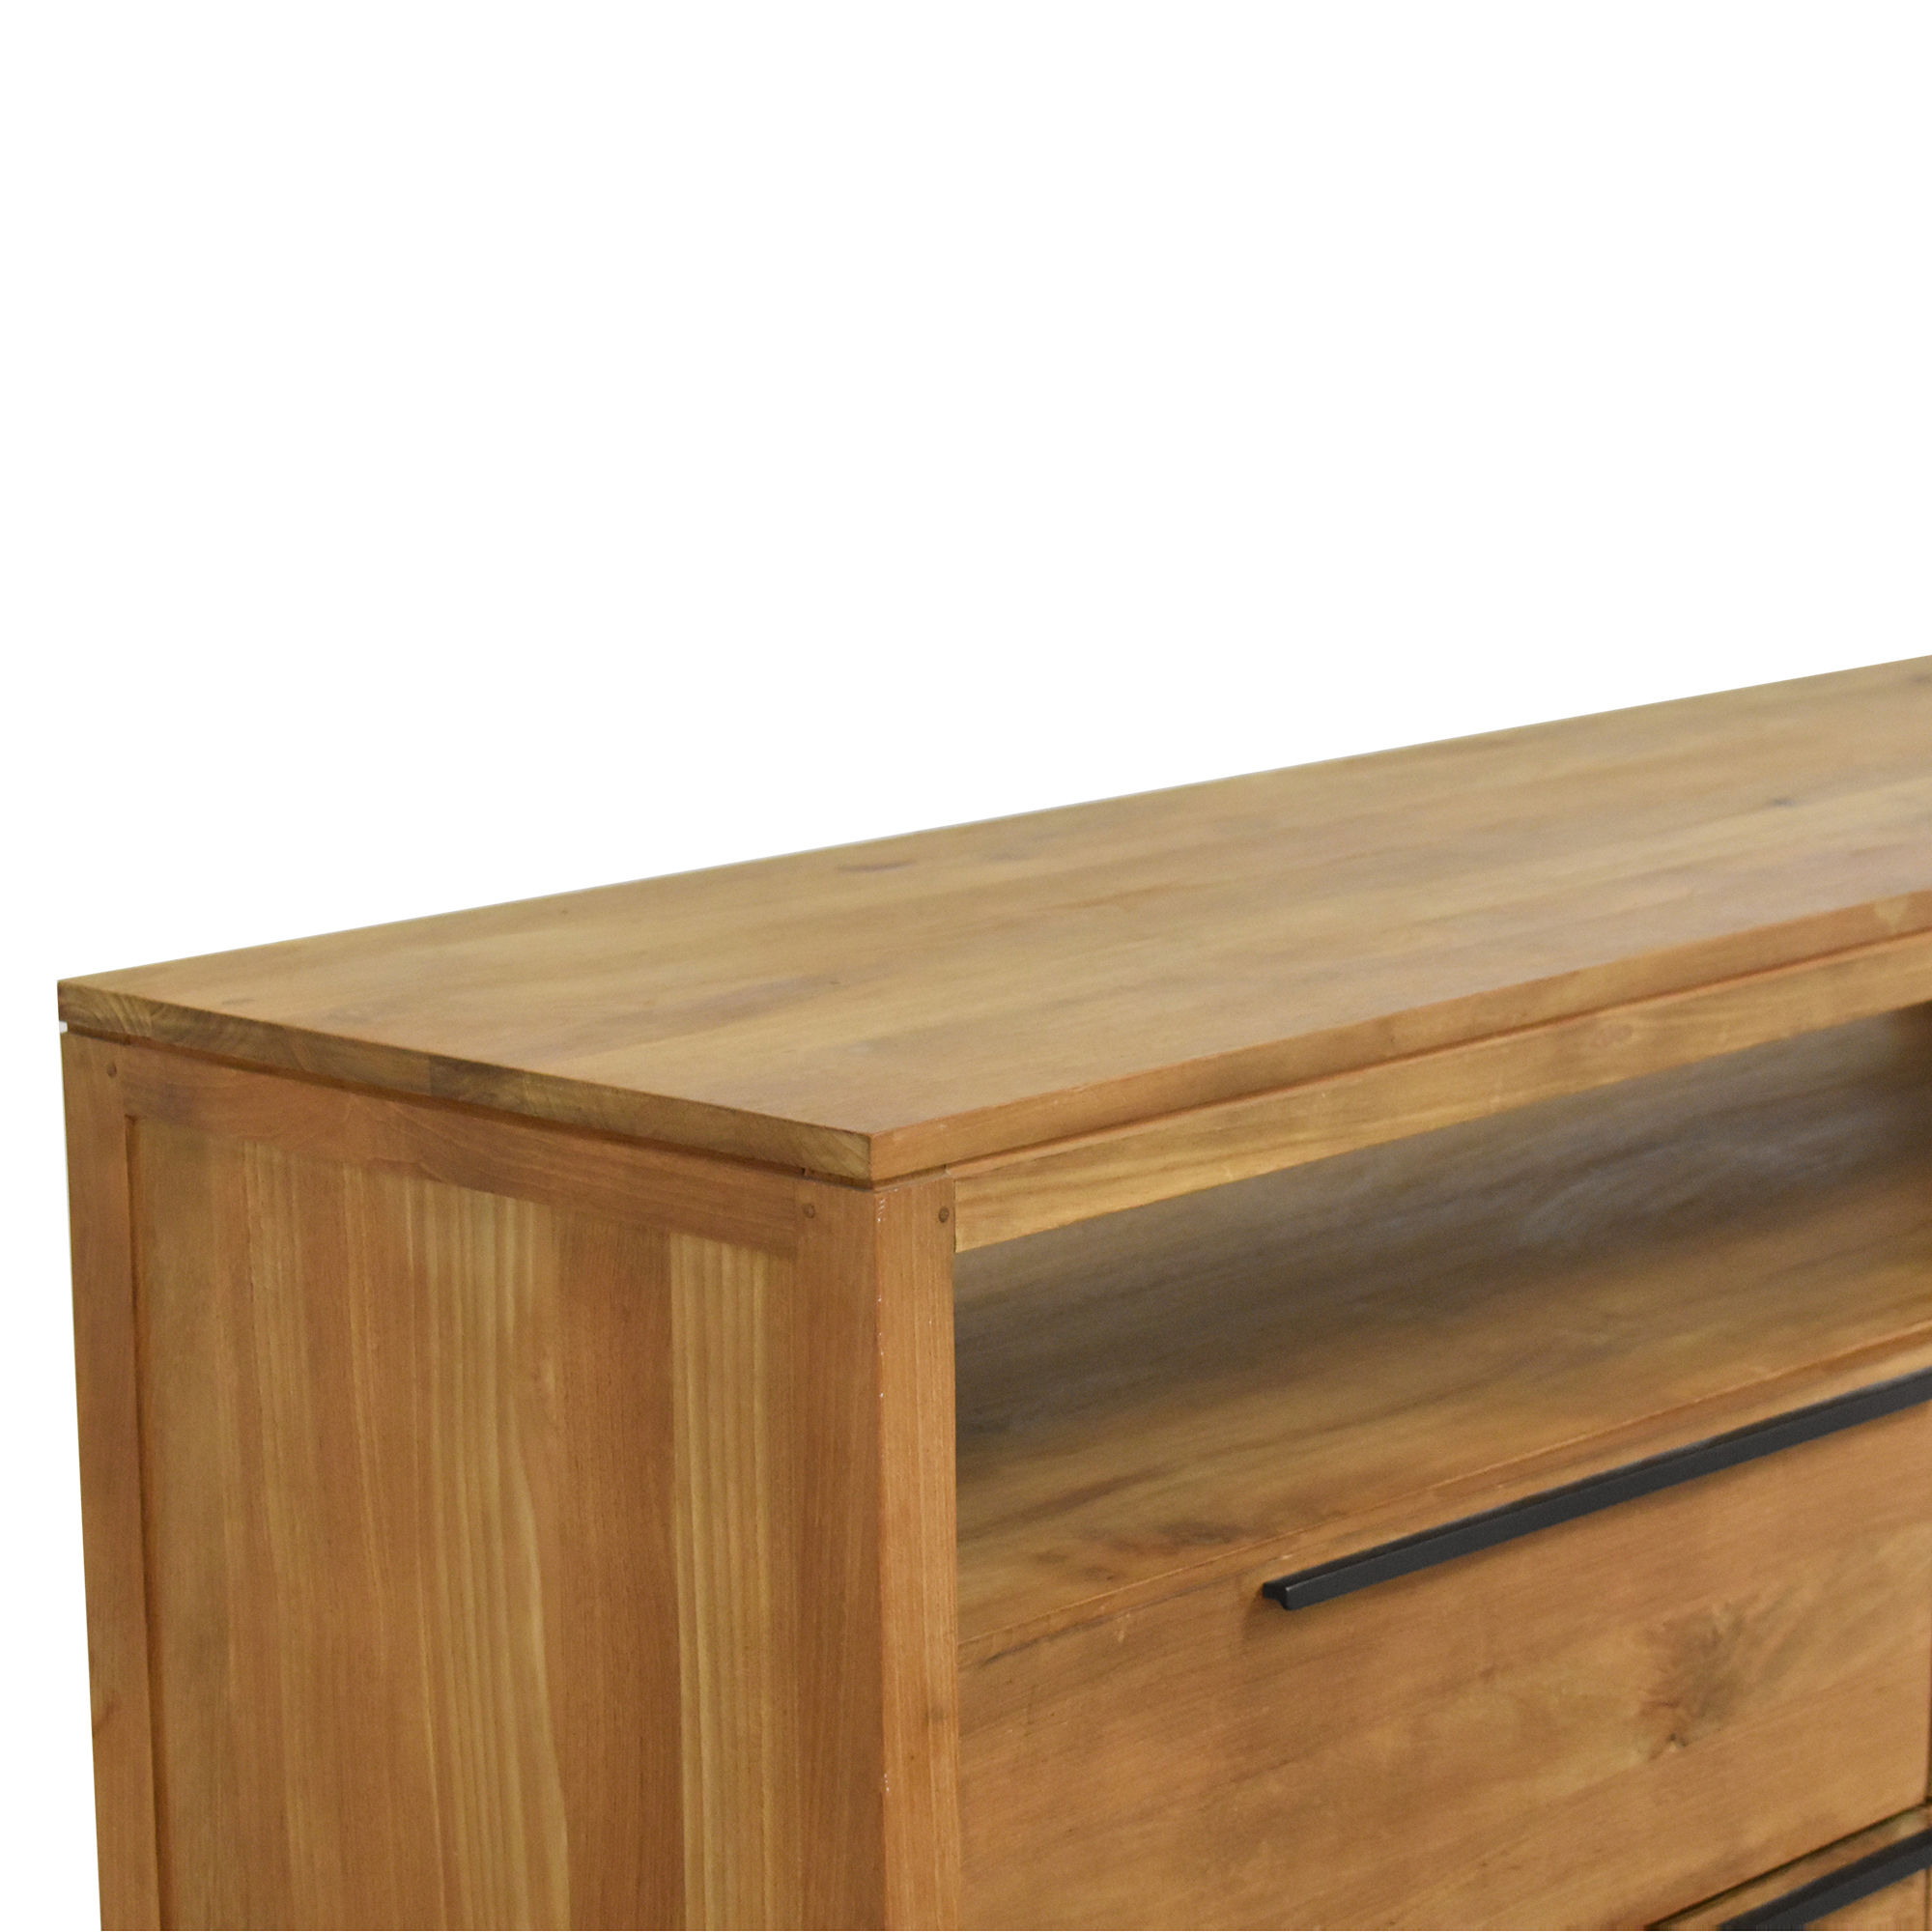 Crate & Barrel Linea Four Drawer Dresser Crate & Barrel